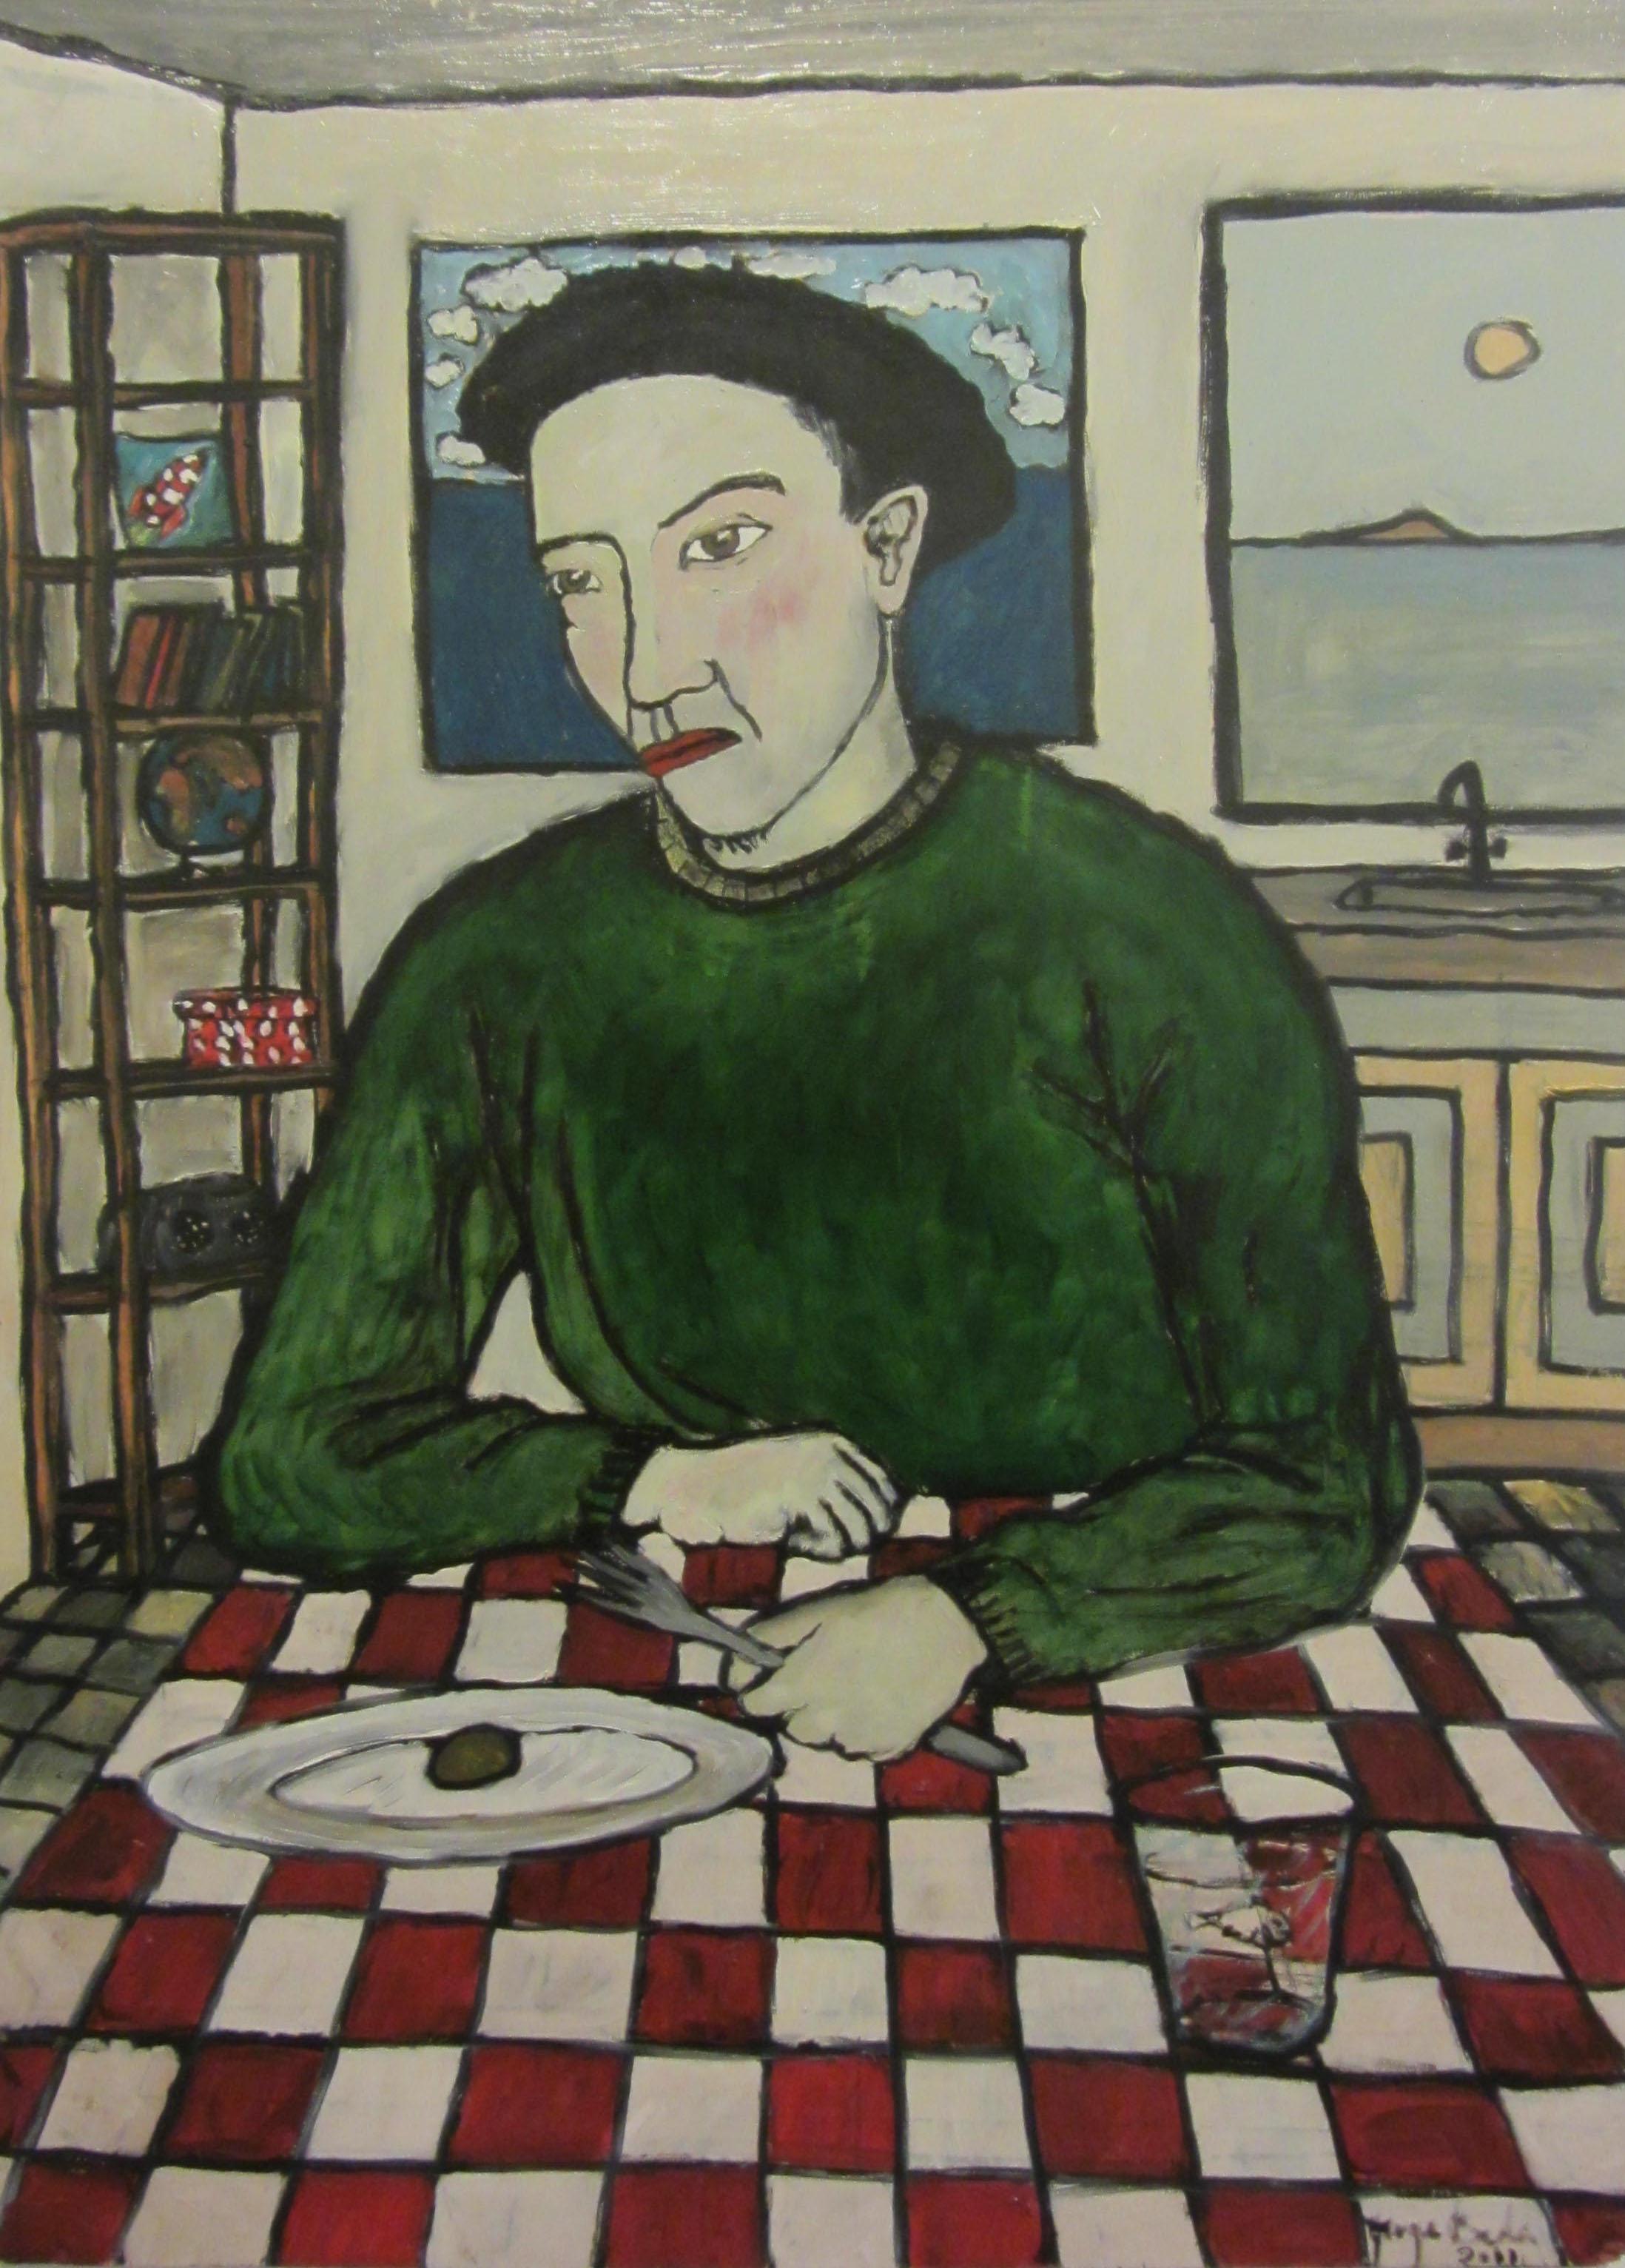 El almuerzo (2014) - Jorge Beda